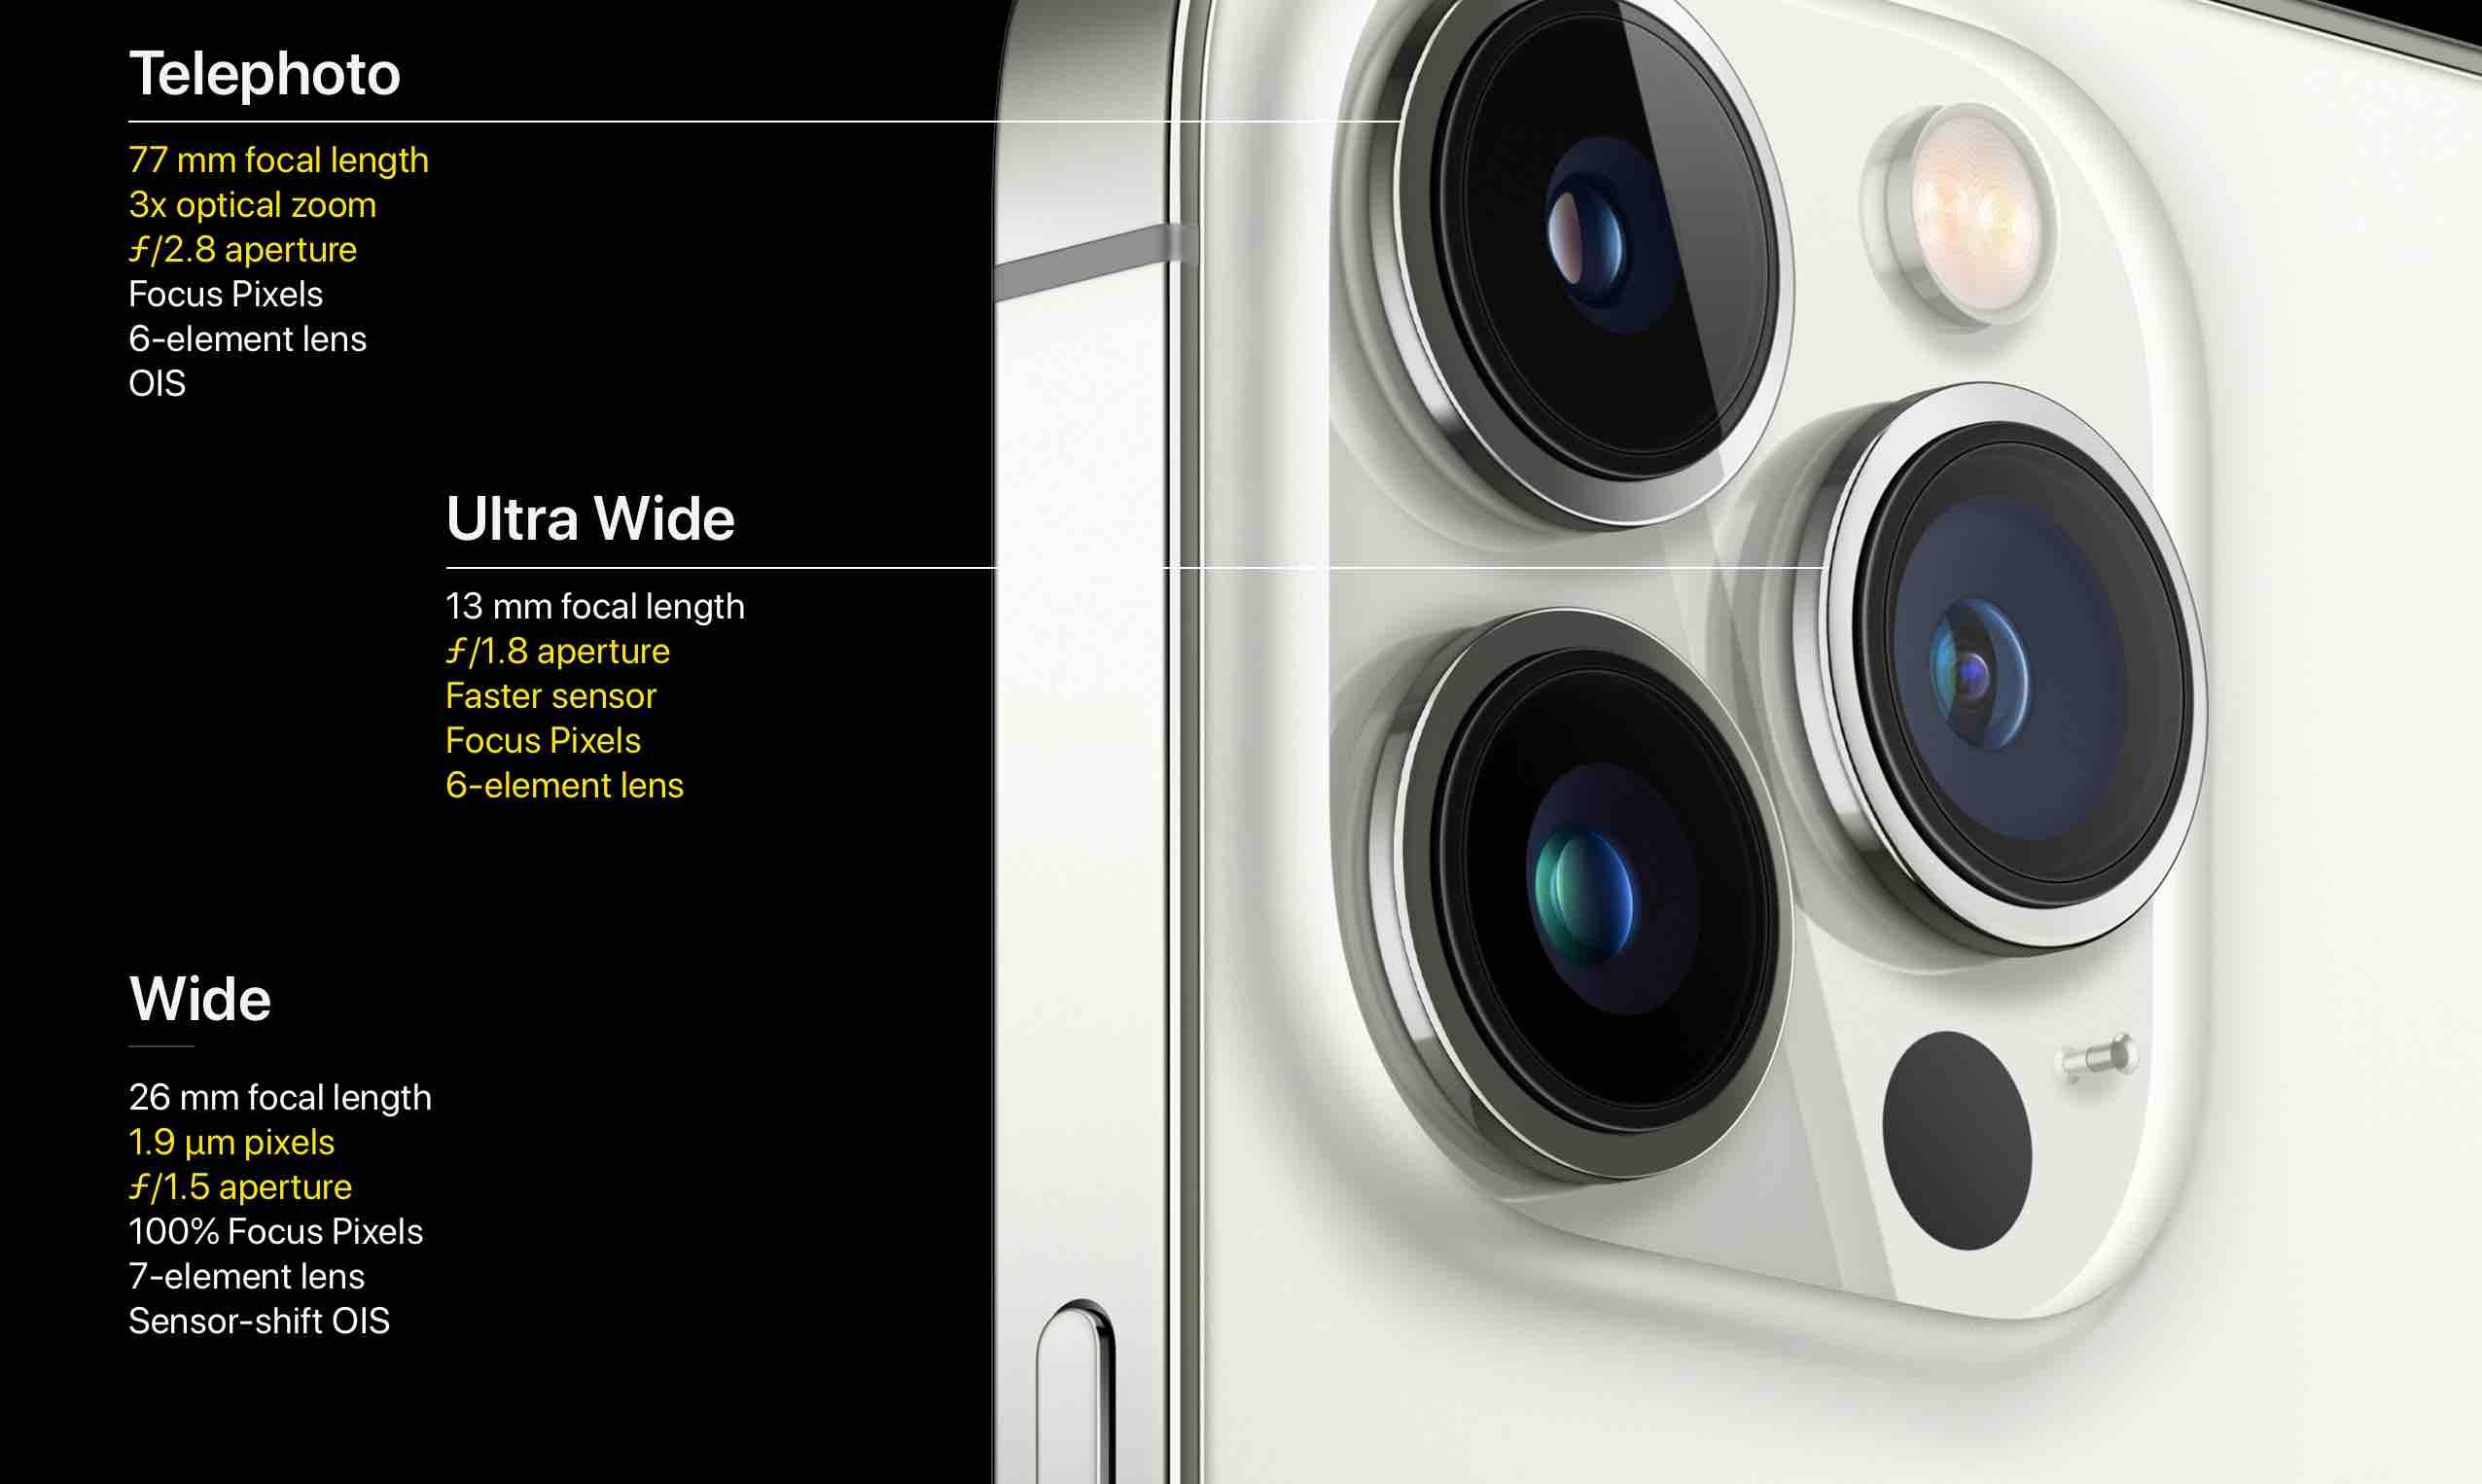 iPhone 13 Pro camera review, iphone 13 pro camera samples, iphone 13 pro max camera, iphone 13 camera review, iphone 13 camera comparison